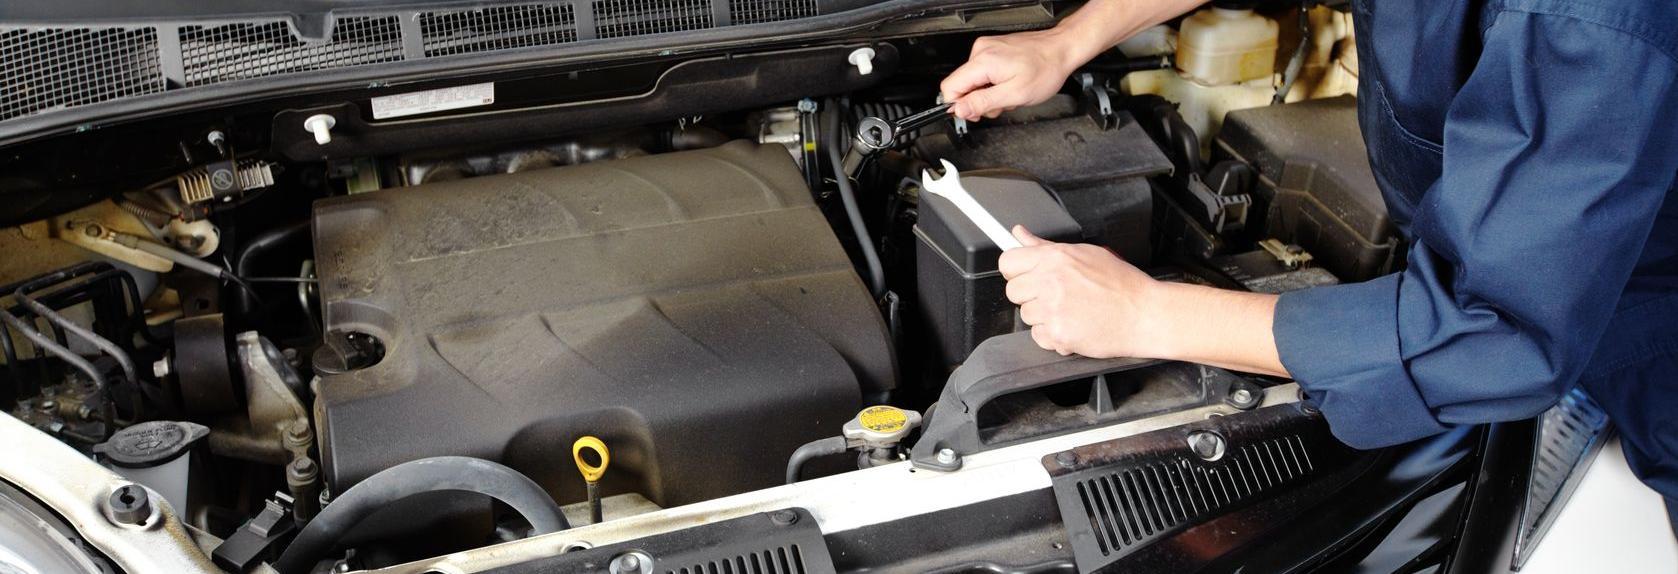 car repair,brakes,oil change,auto inspection,tires,auto repair,downingtown, car service near me